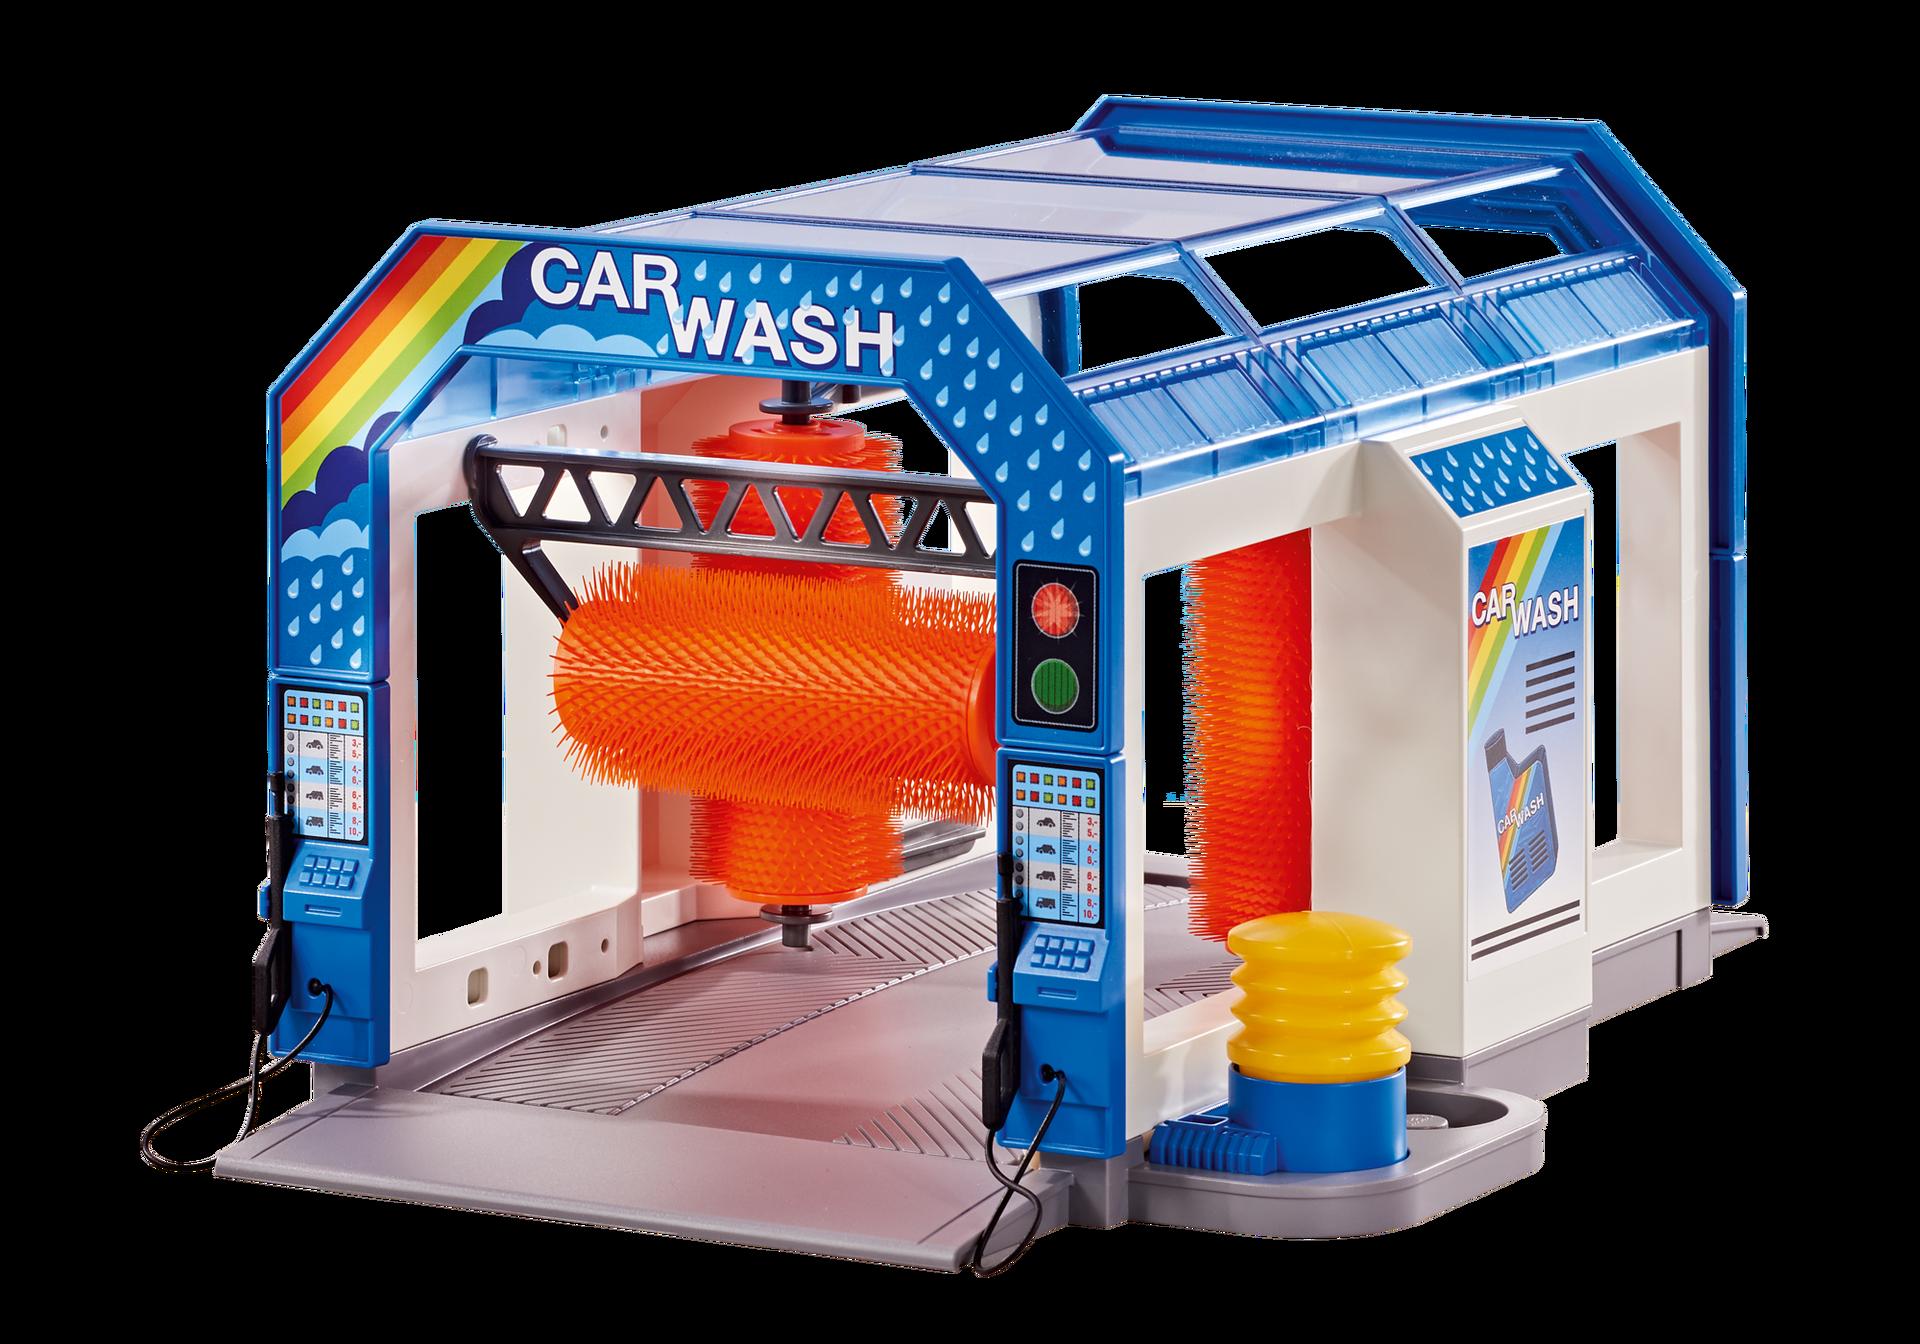 Playmobil Car Wash